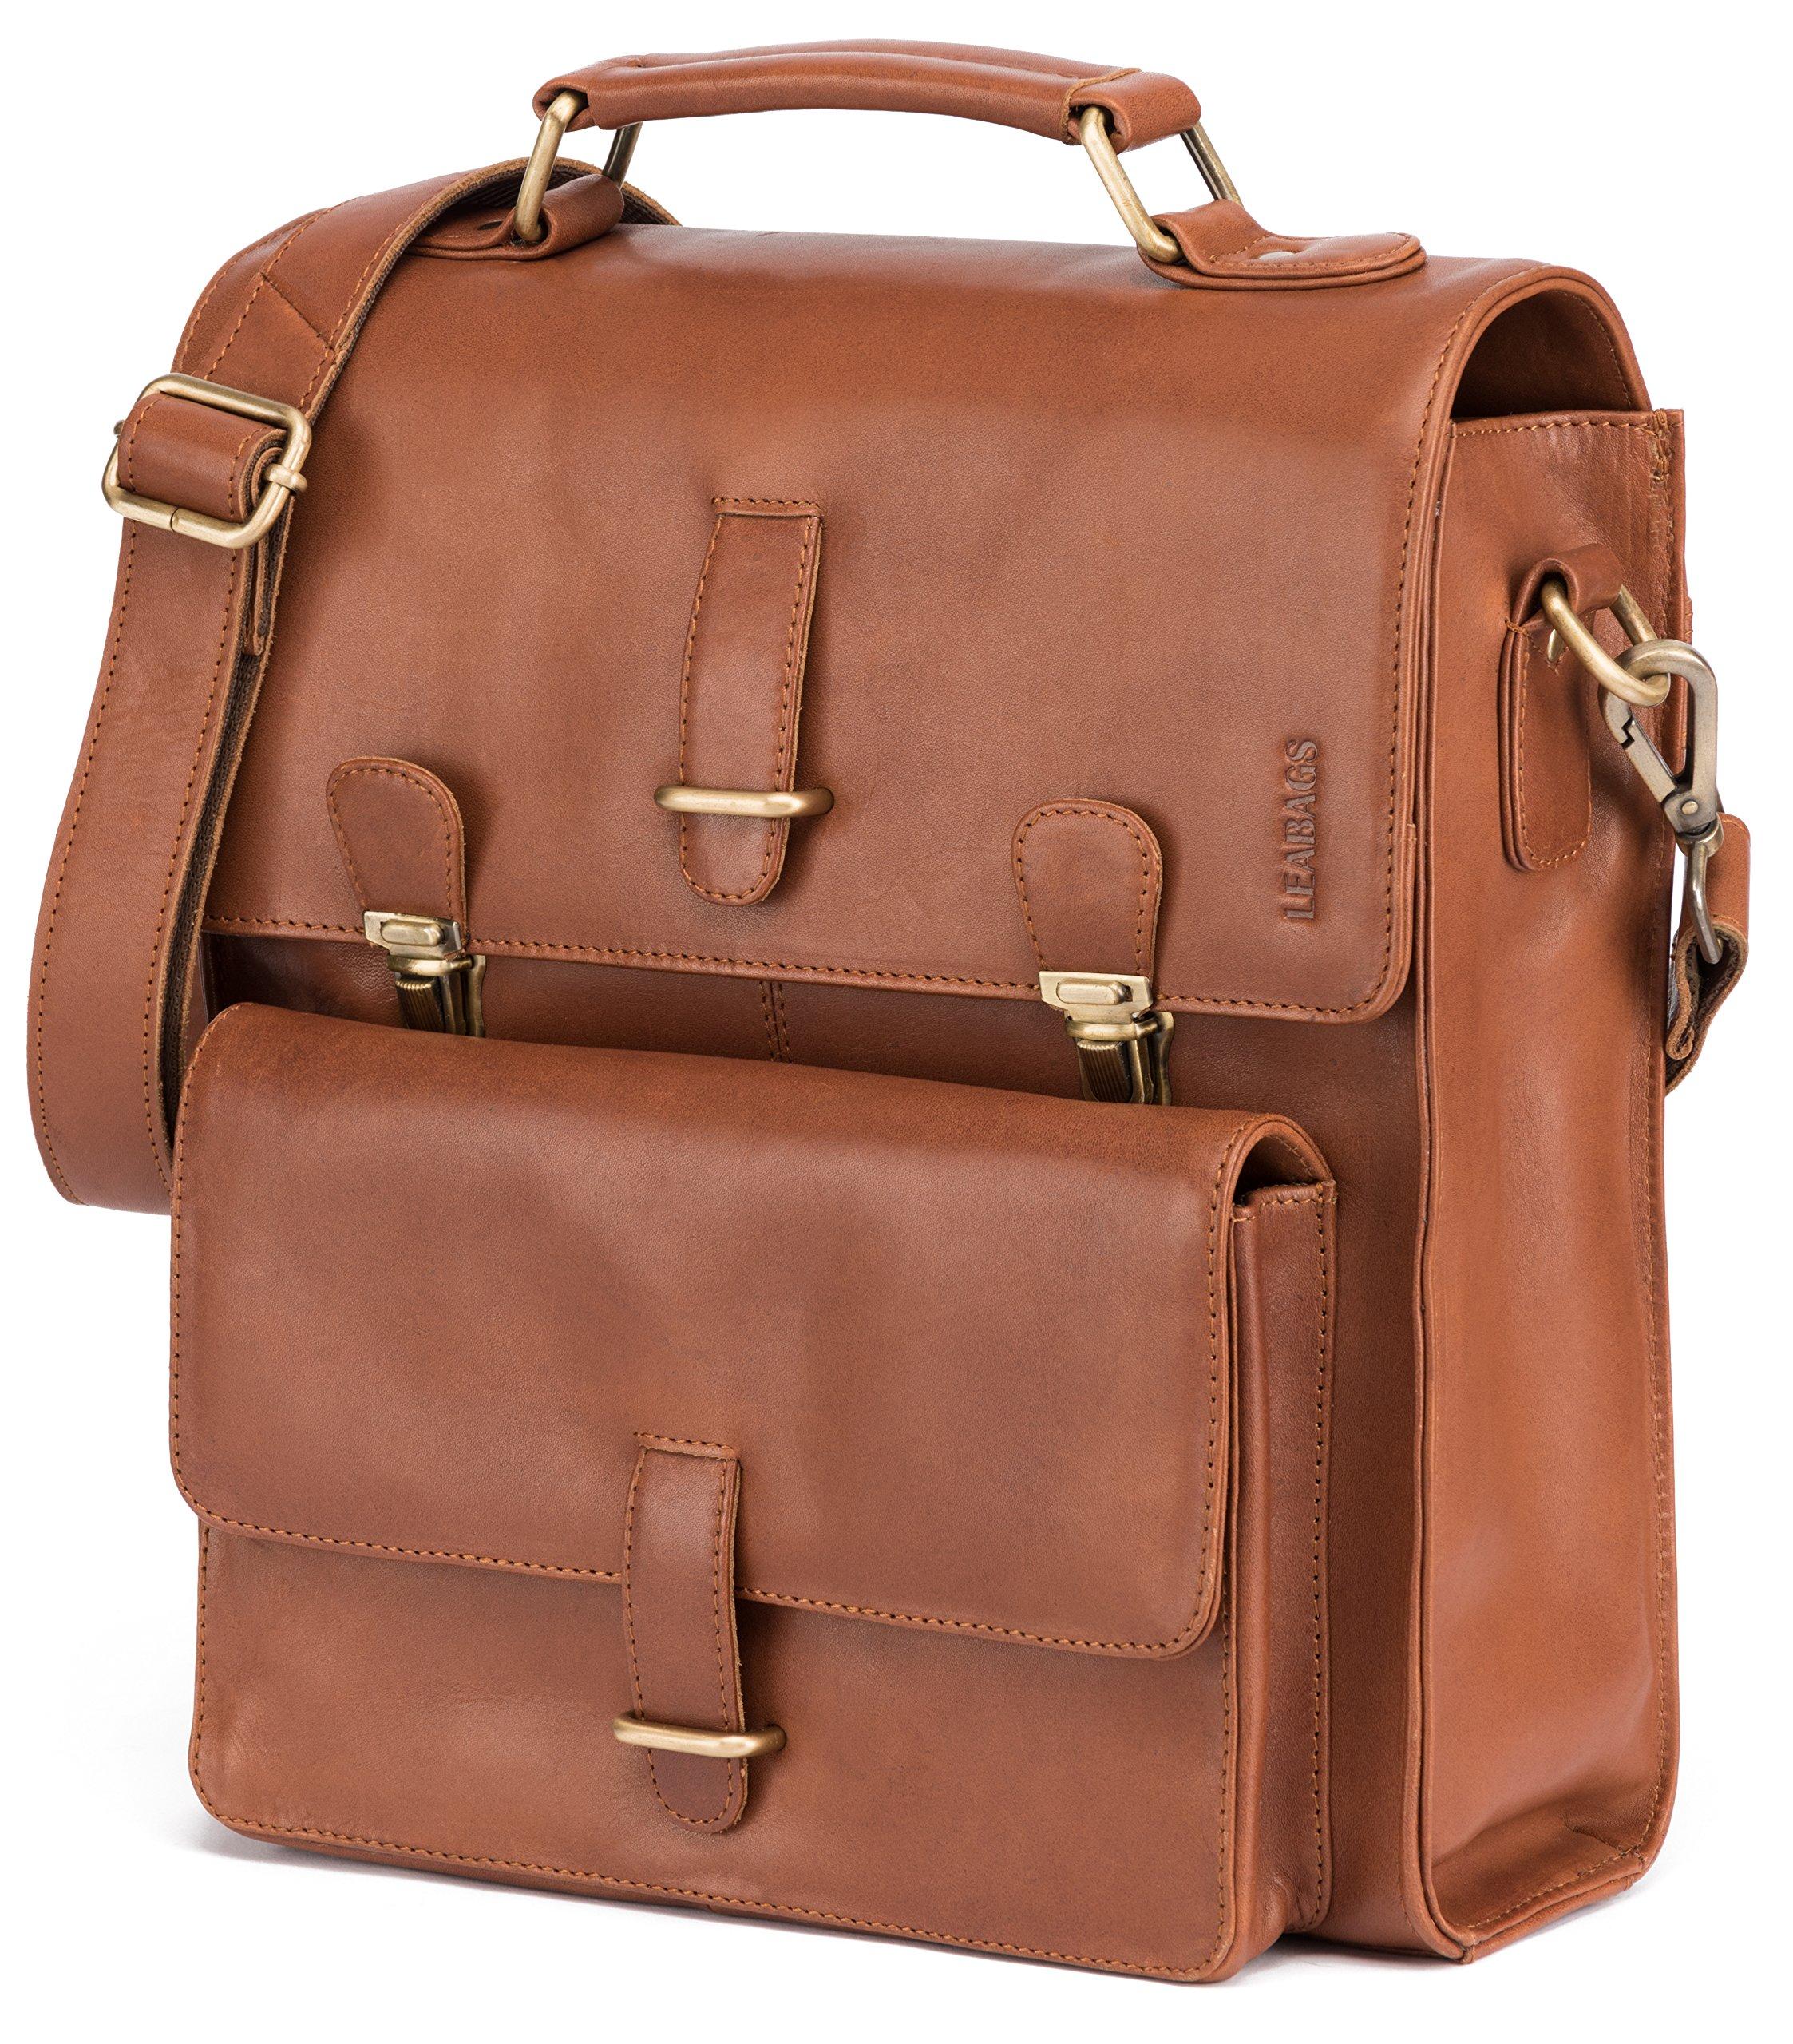 91CObFWh qL - LEABAGS Lille maletín de auténtico Cuero búfalo en el Estilo Vintage